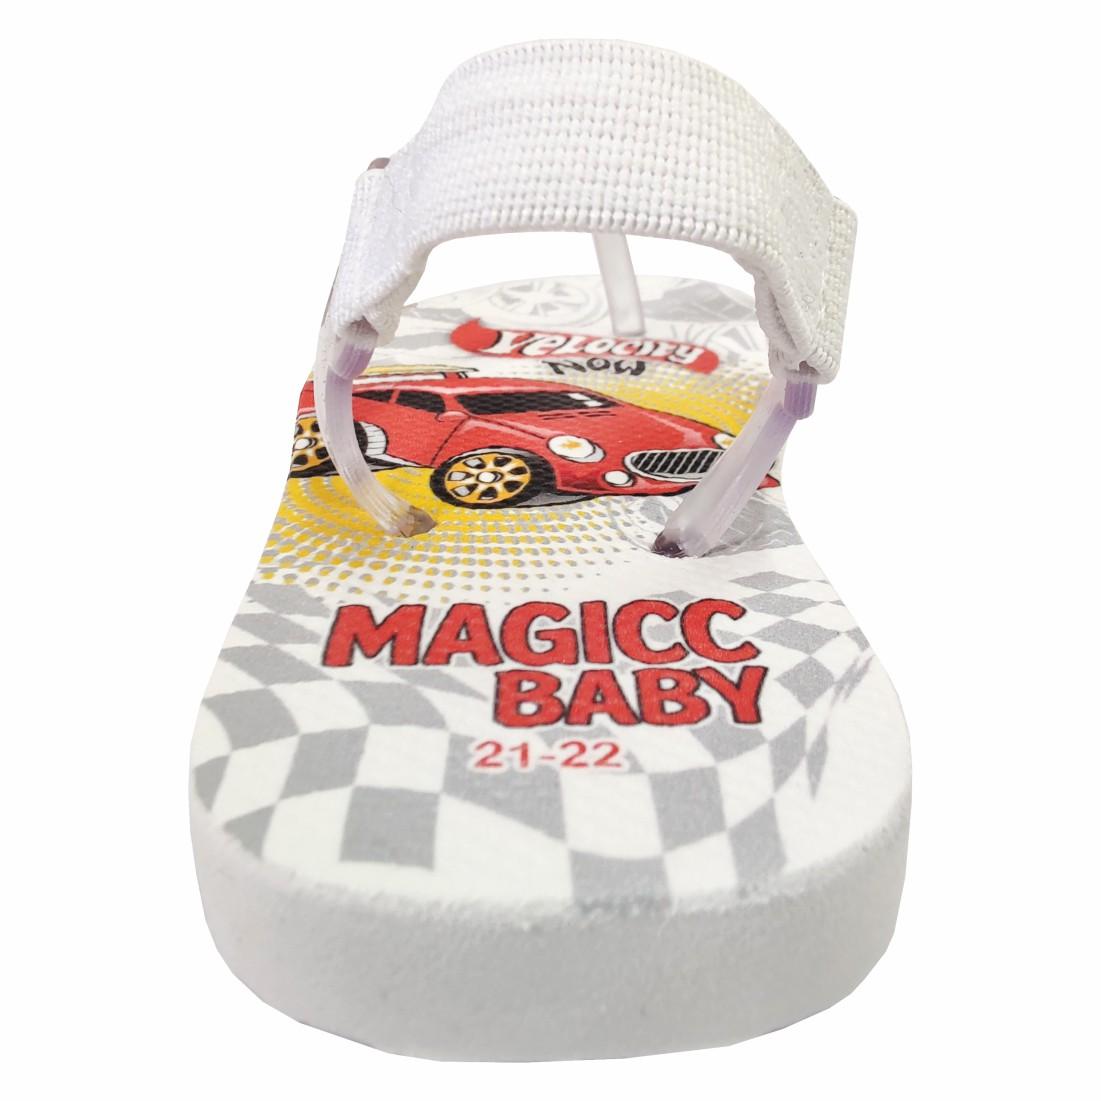 Chinelo Bebê Sandália Infantil Velocity Bebês Meninos Magicc Baby